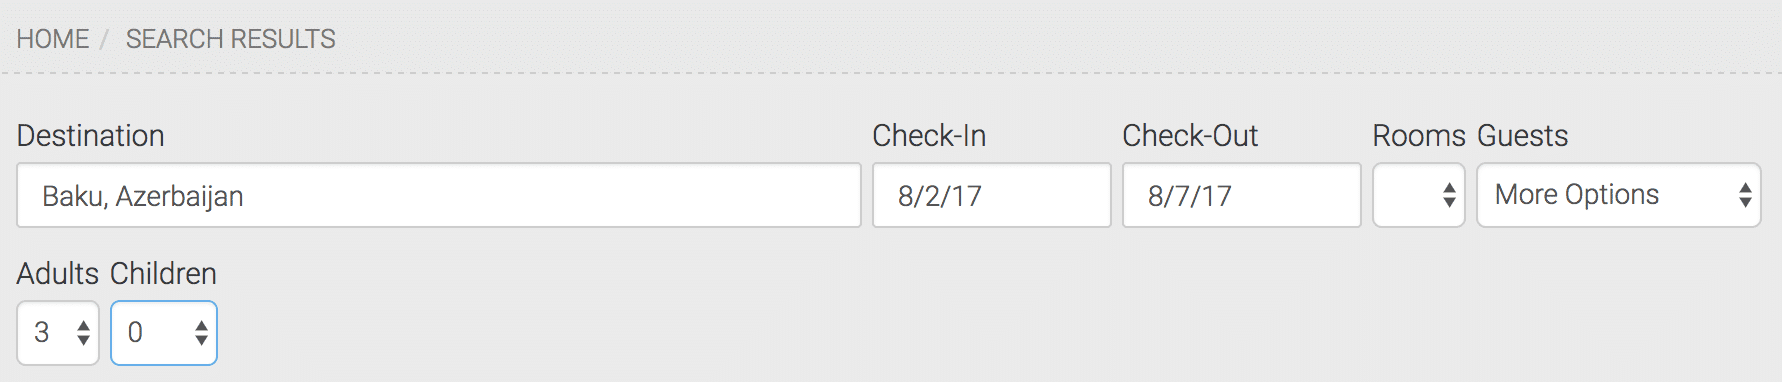 Sears dates